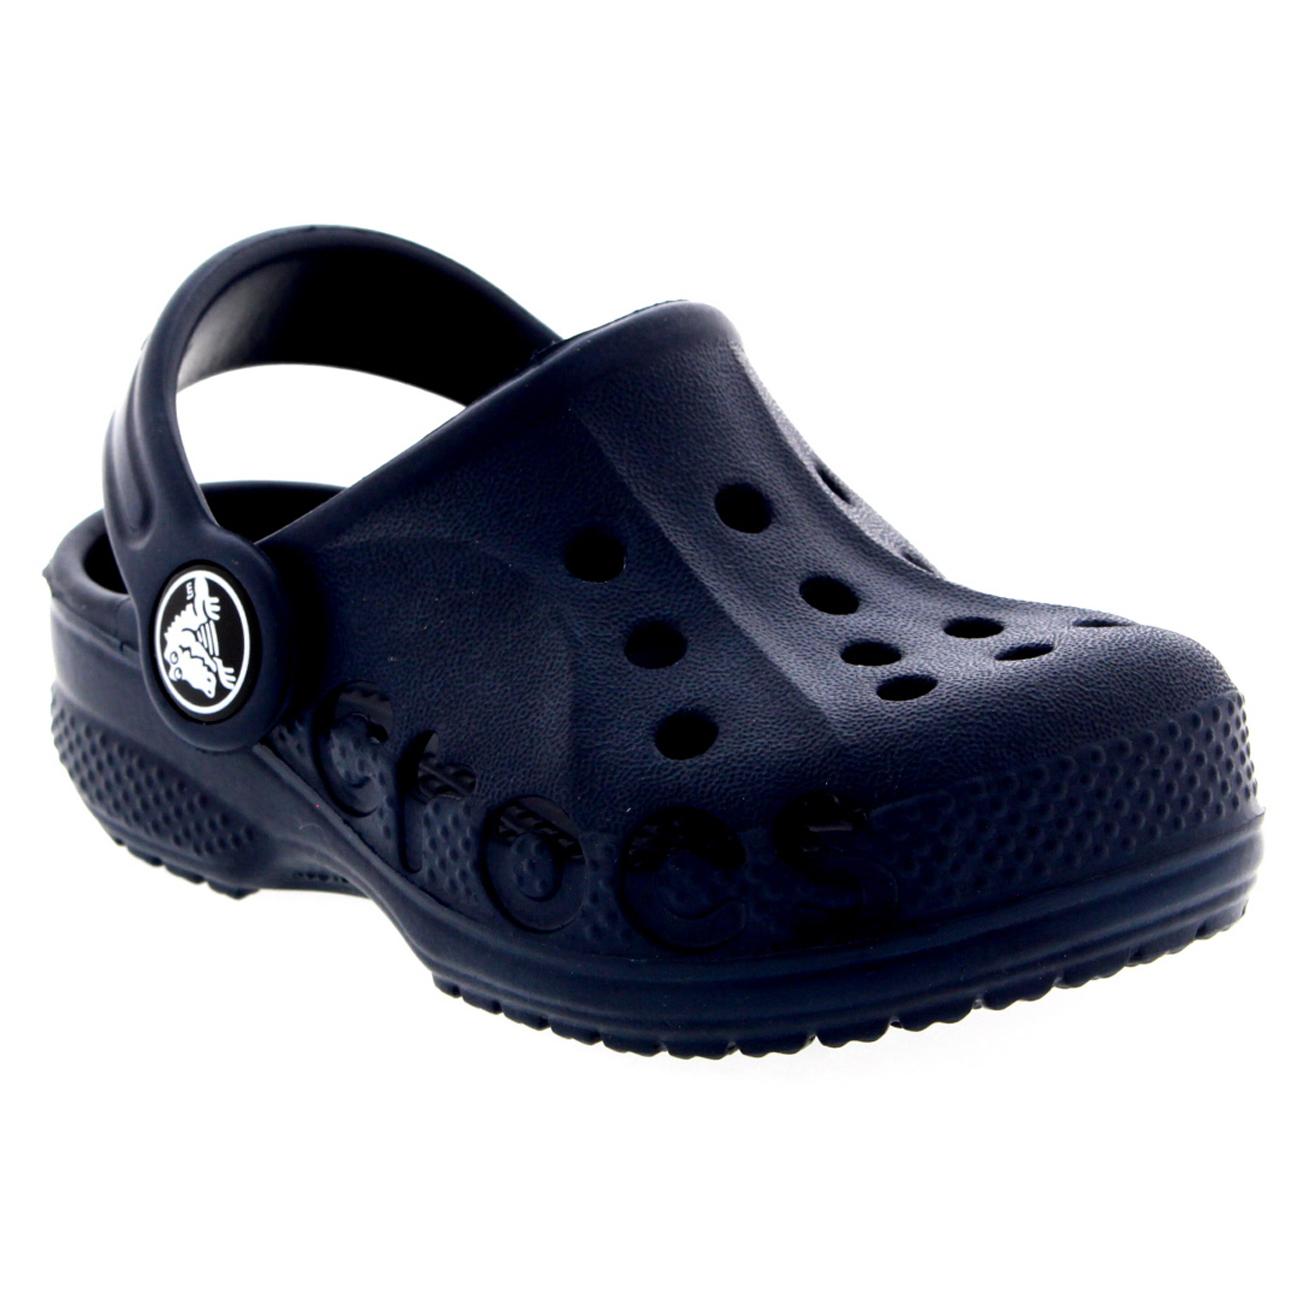 Unisex Kids Crocs Baya